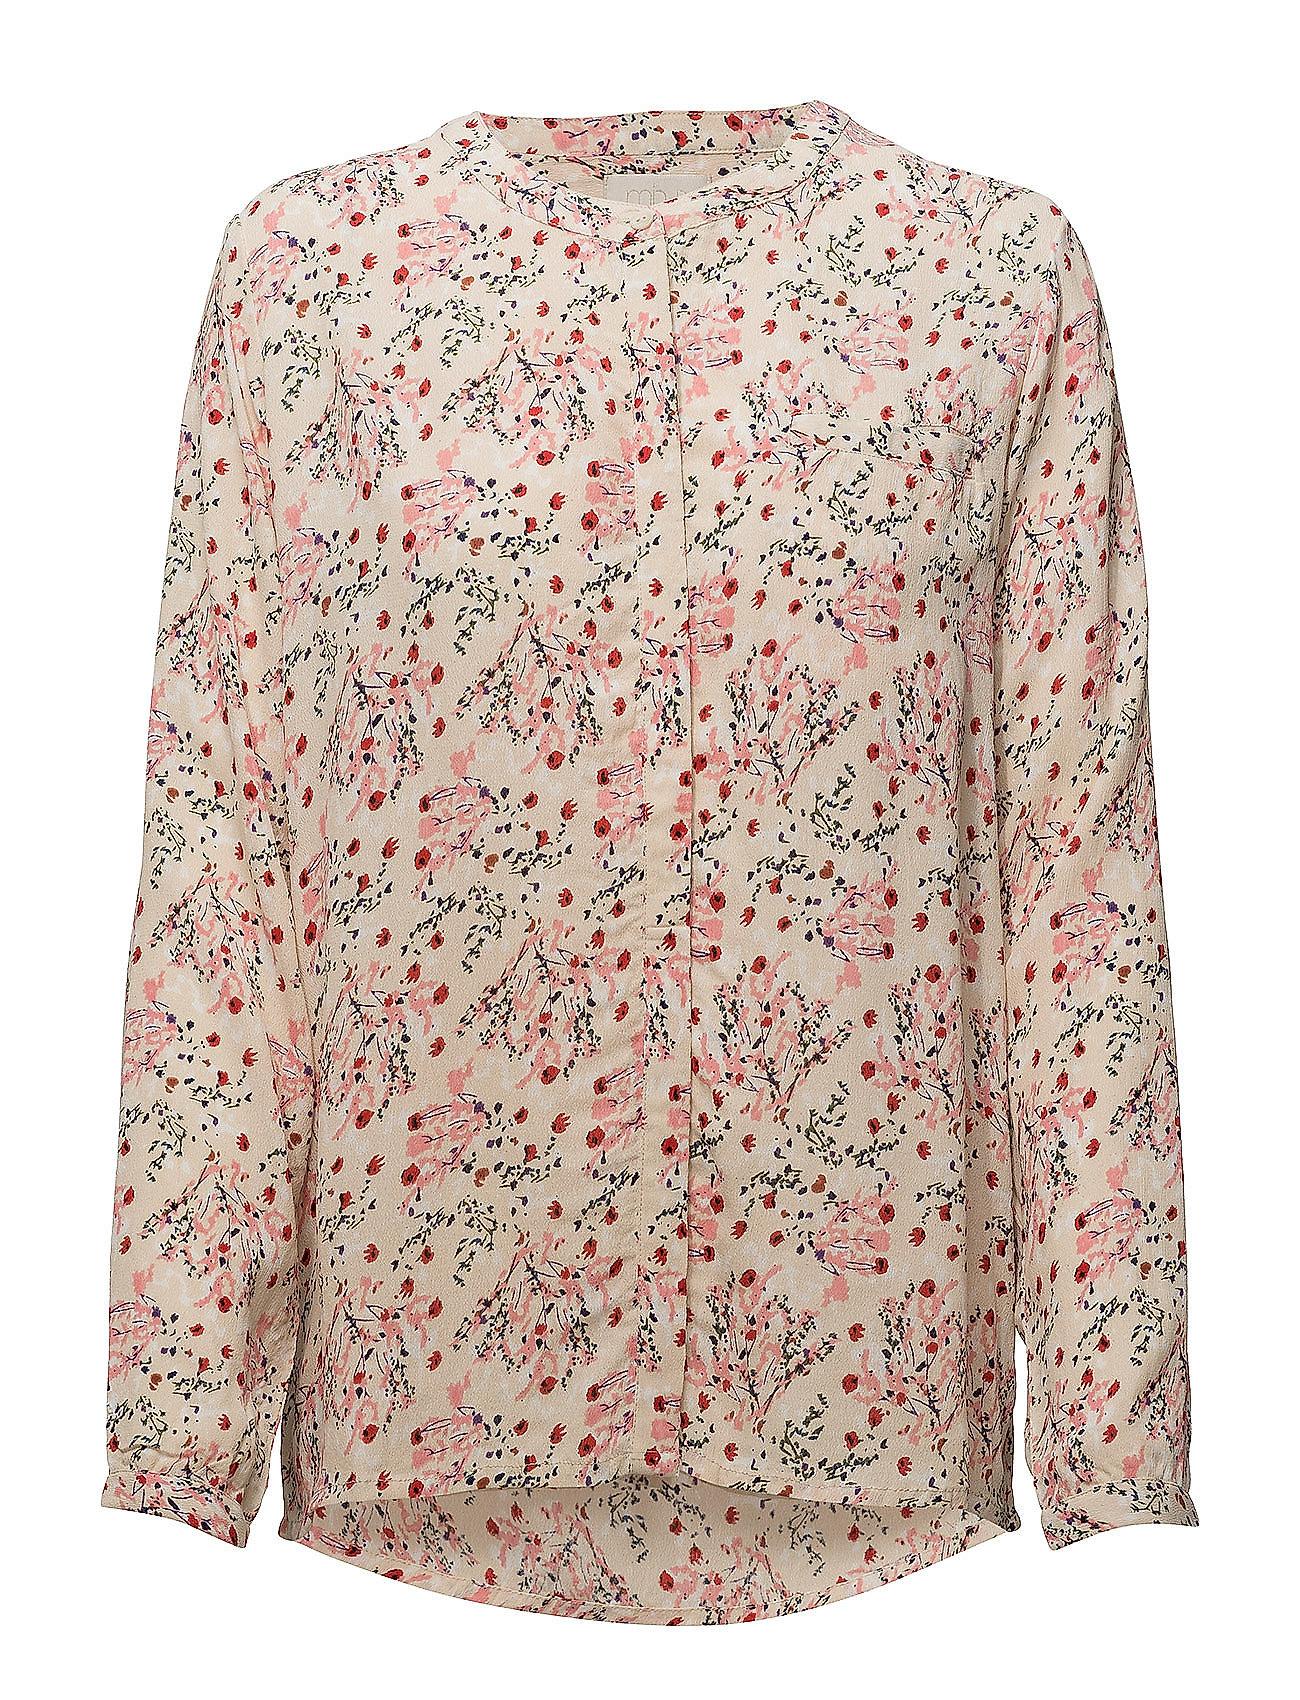 Elvine shirt pink flower print 4550 minus blouses boozt minus elvine shirt mightylinksfo